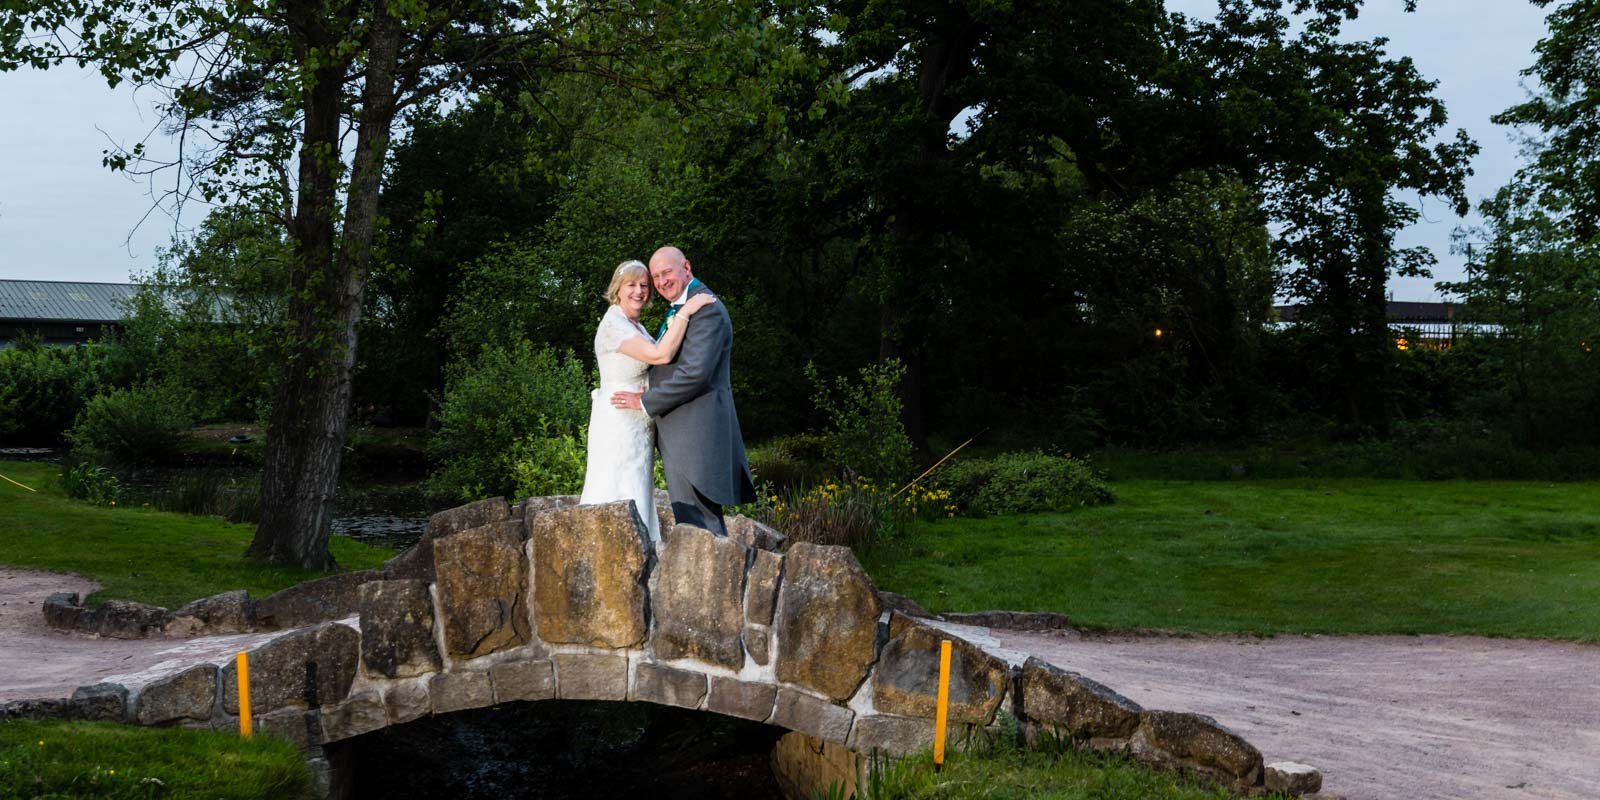 Bride and Groom evening wedding portrait